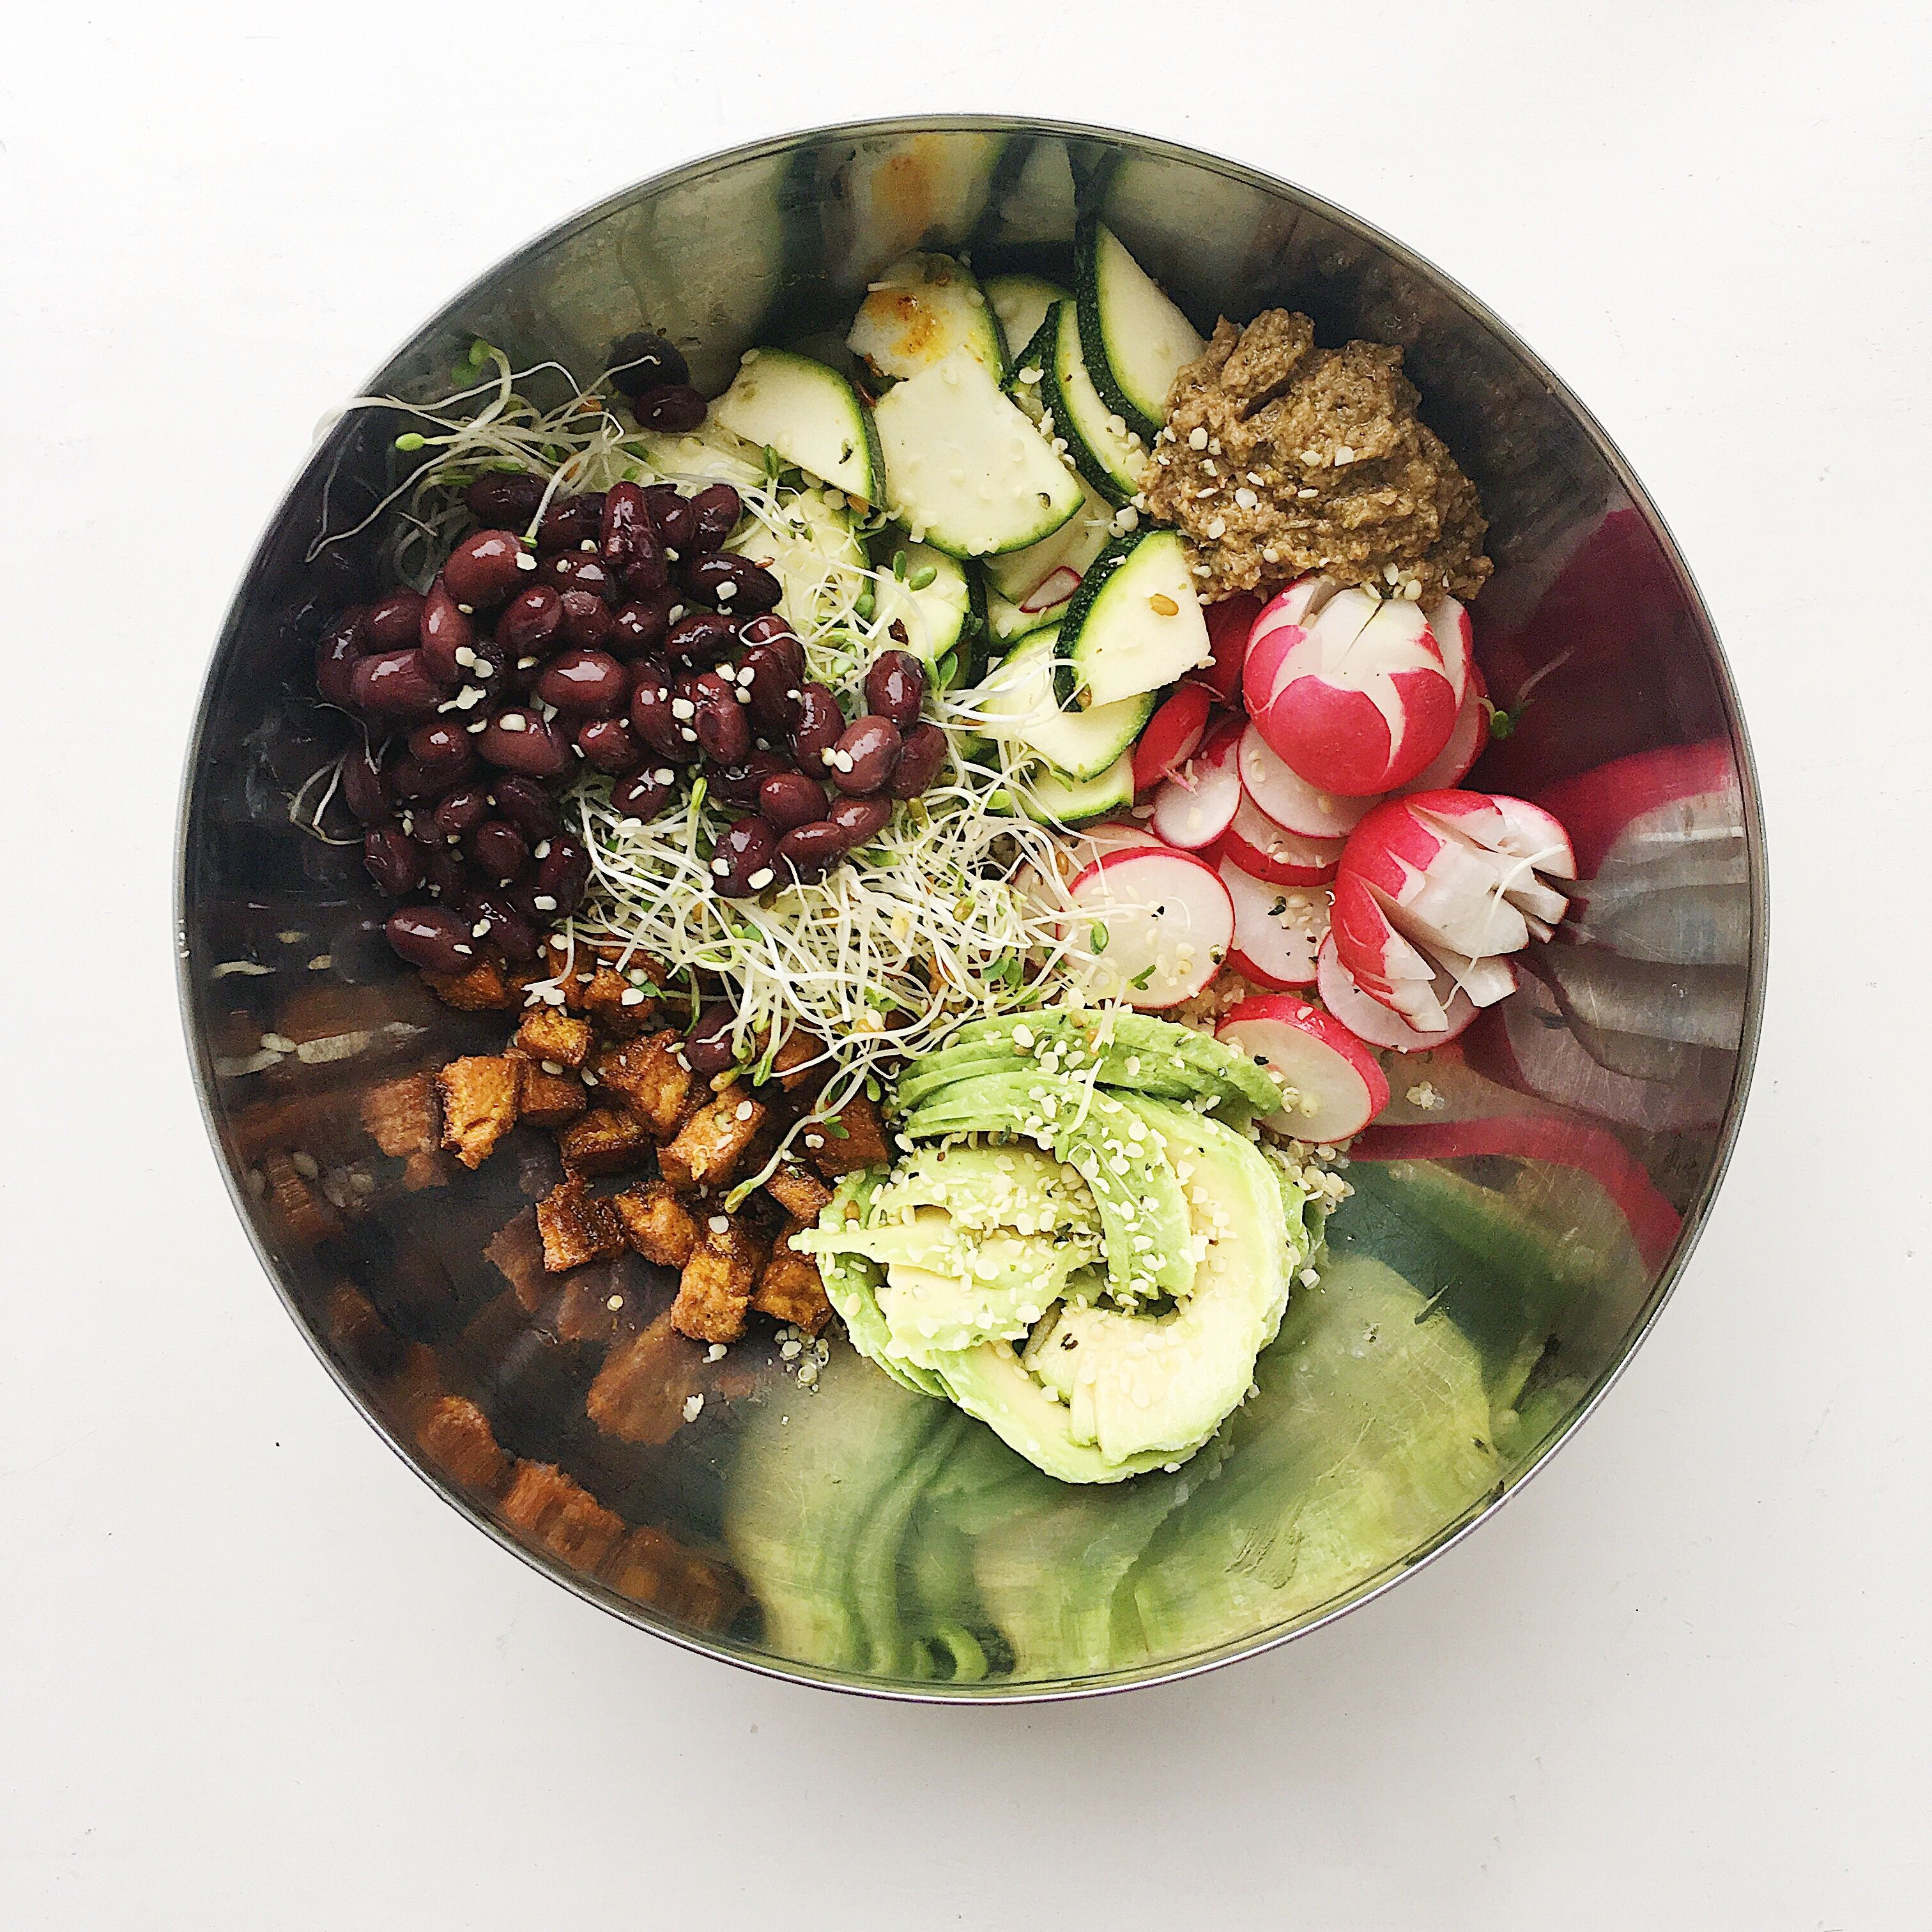 Buddha Bowl! Full recipe at http://marinkaessel.com/2017/06/14/10-minute-buddha-bowl/